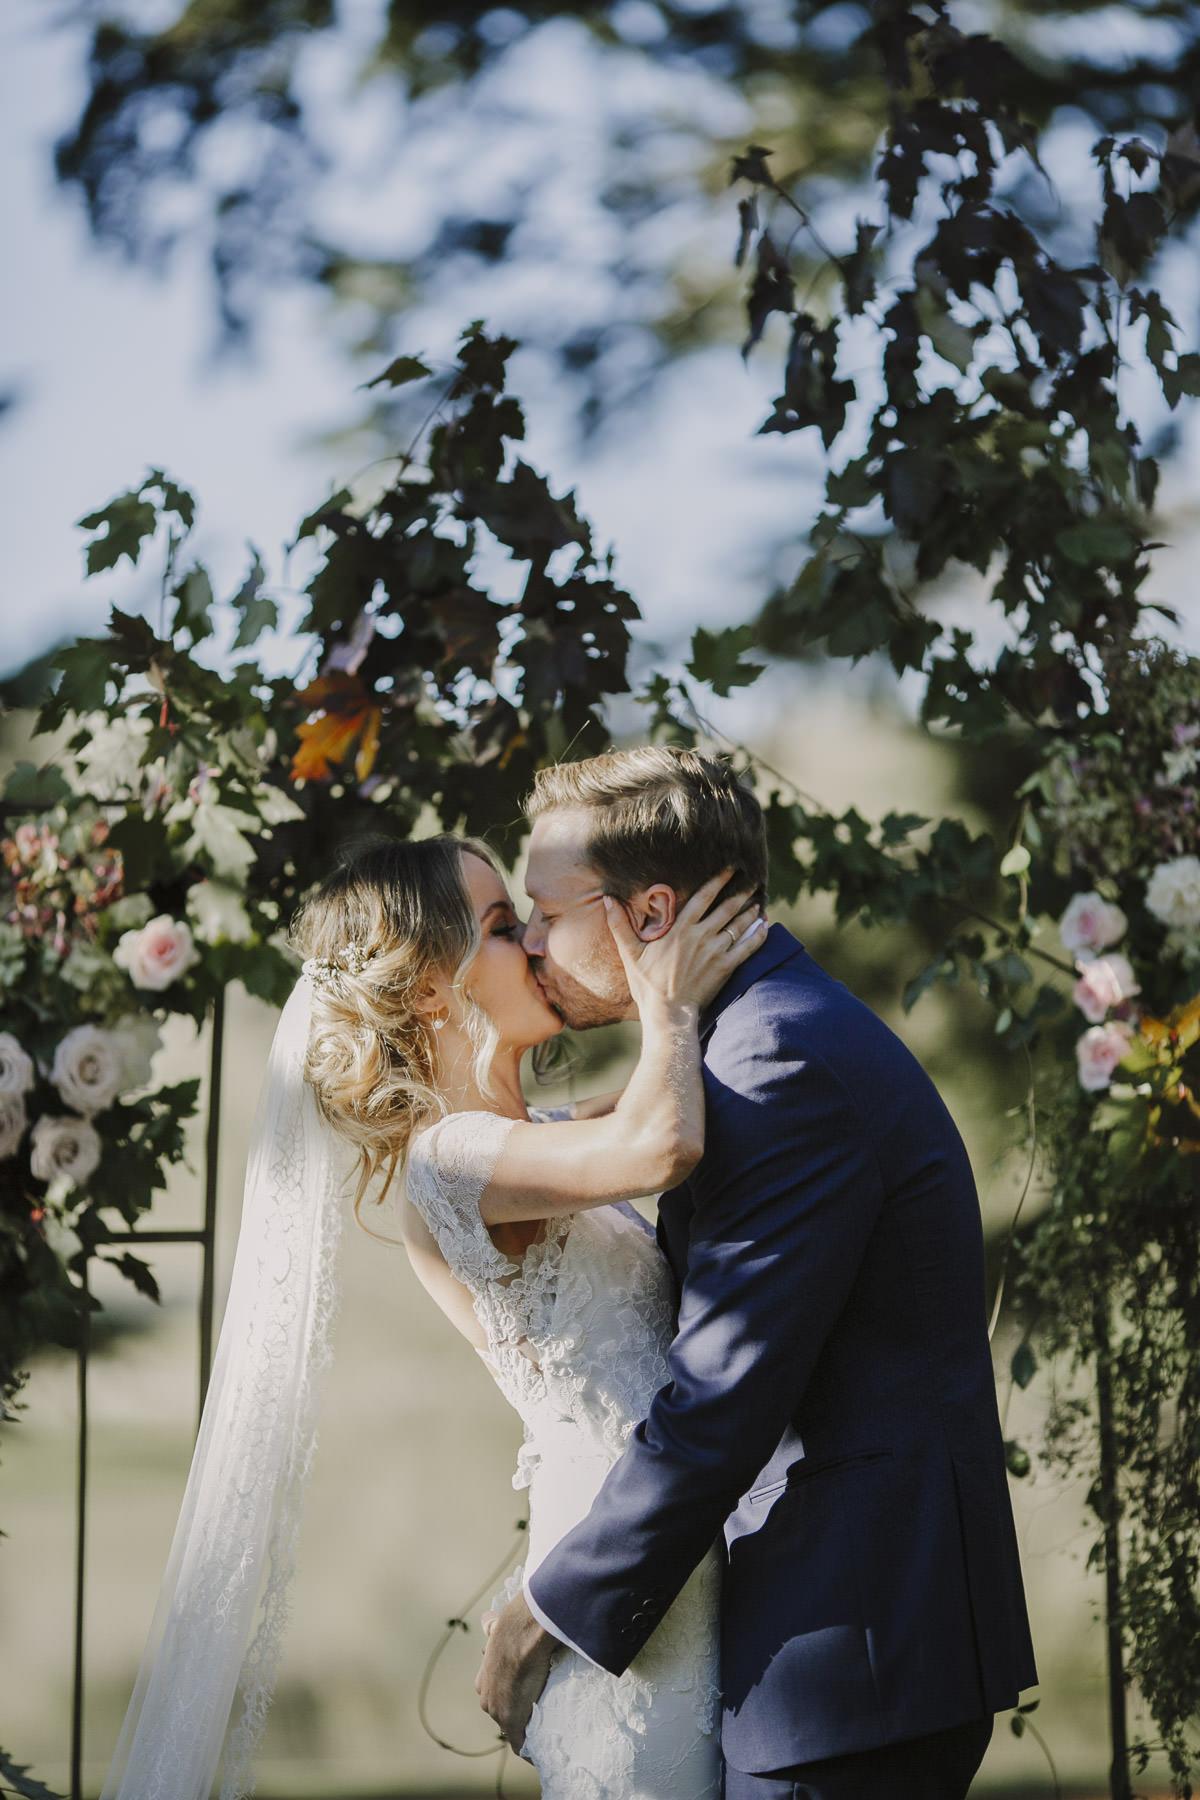 160506_justinaaron_wedding_holly_daniel_pr-110.jpg